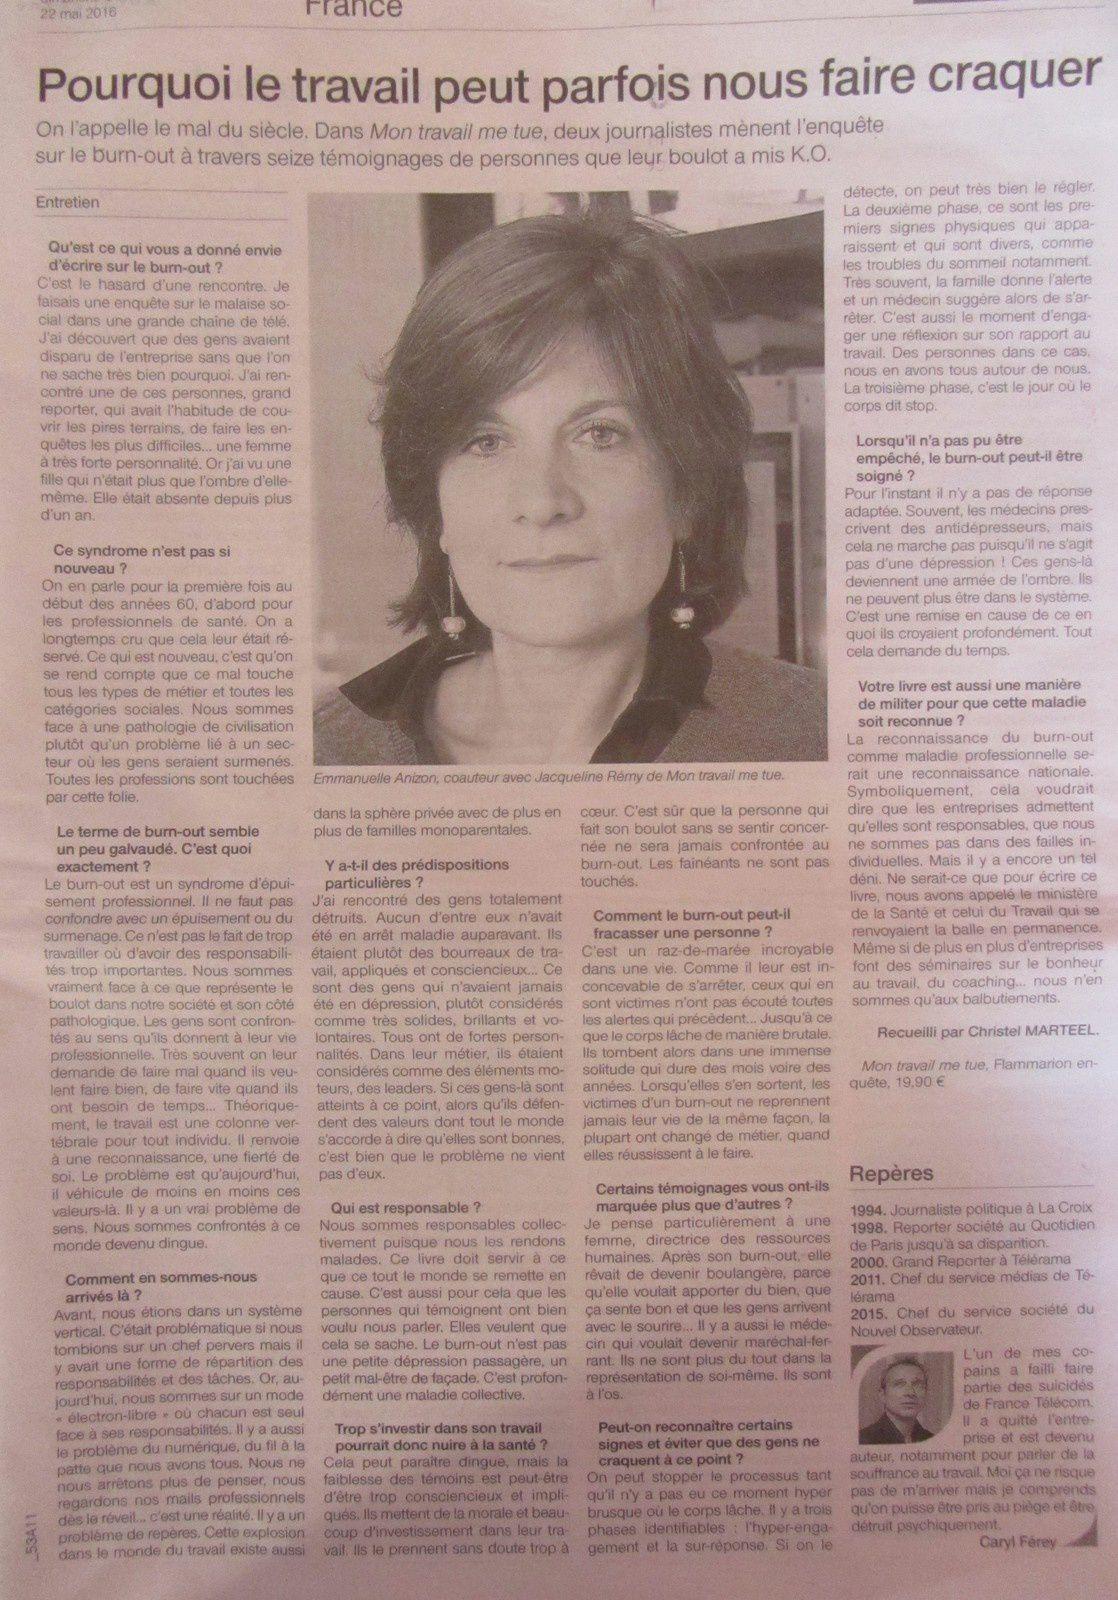 article ouest france dimanche 22 mai 2016 - burn out